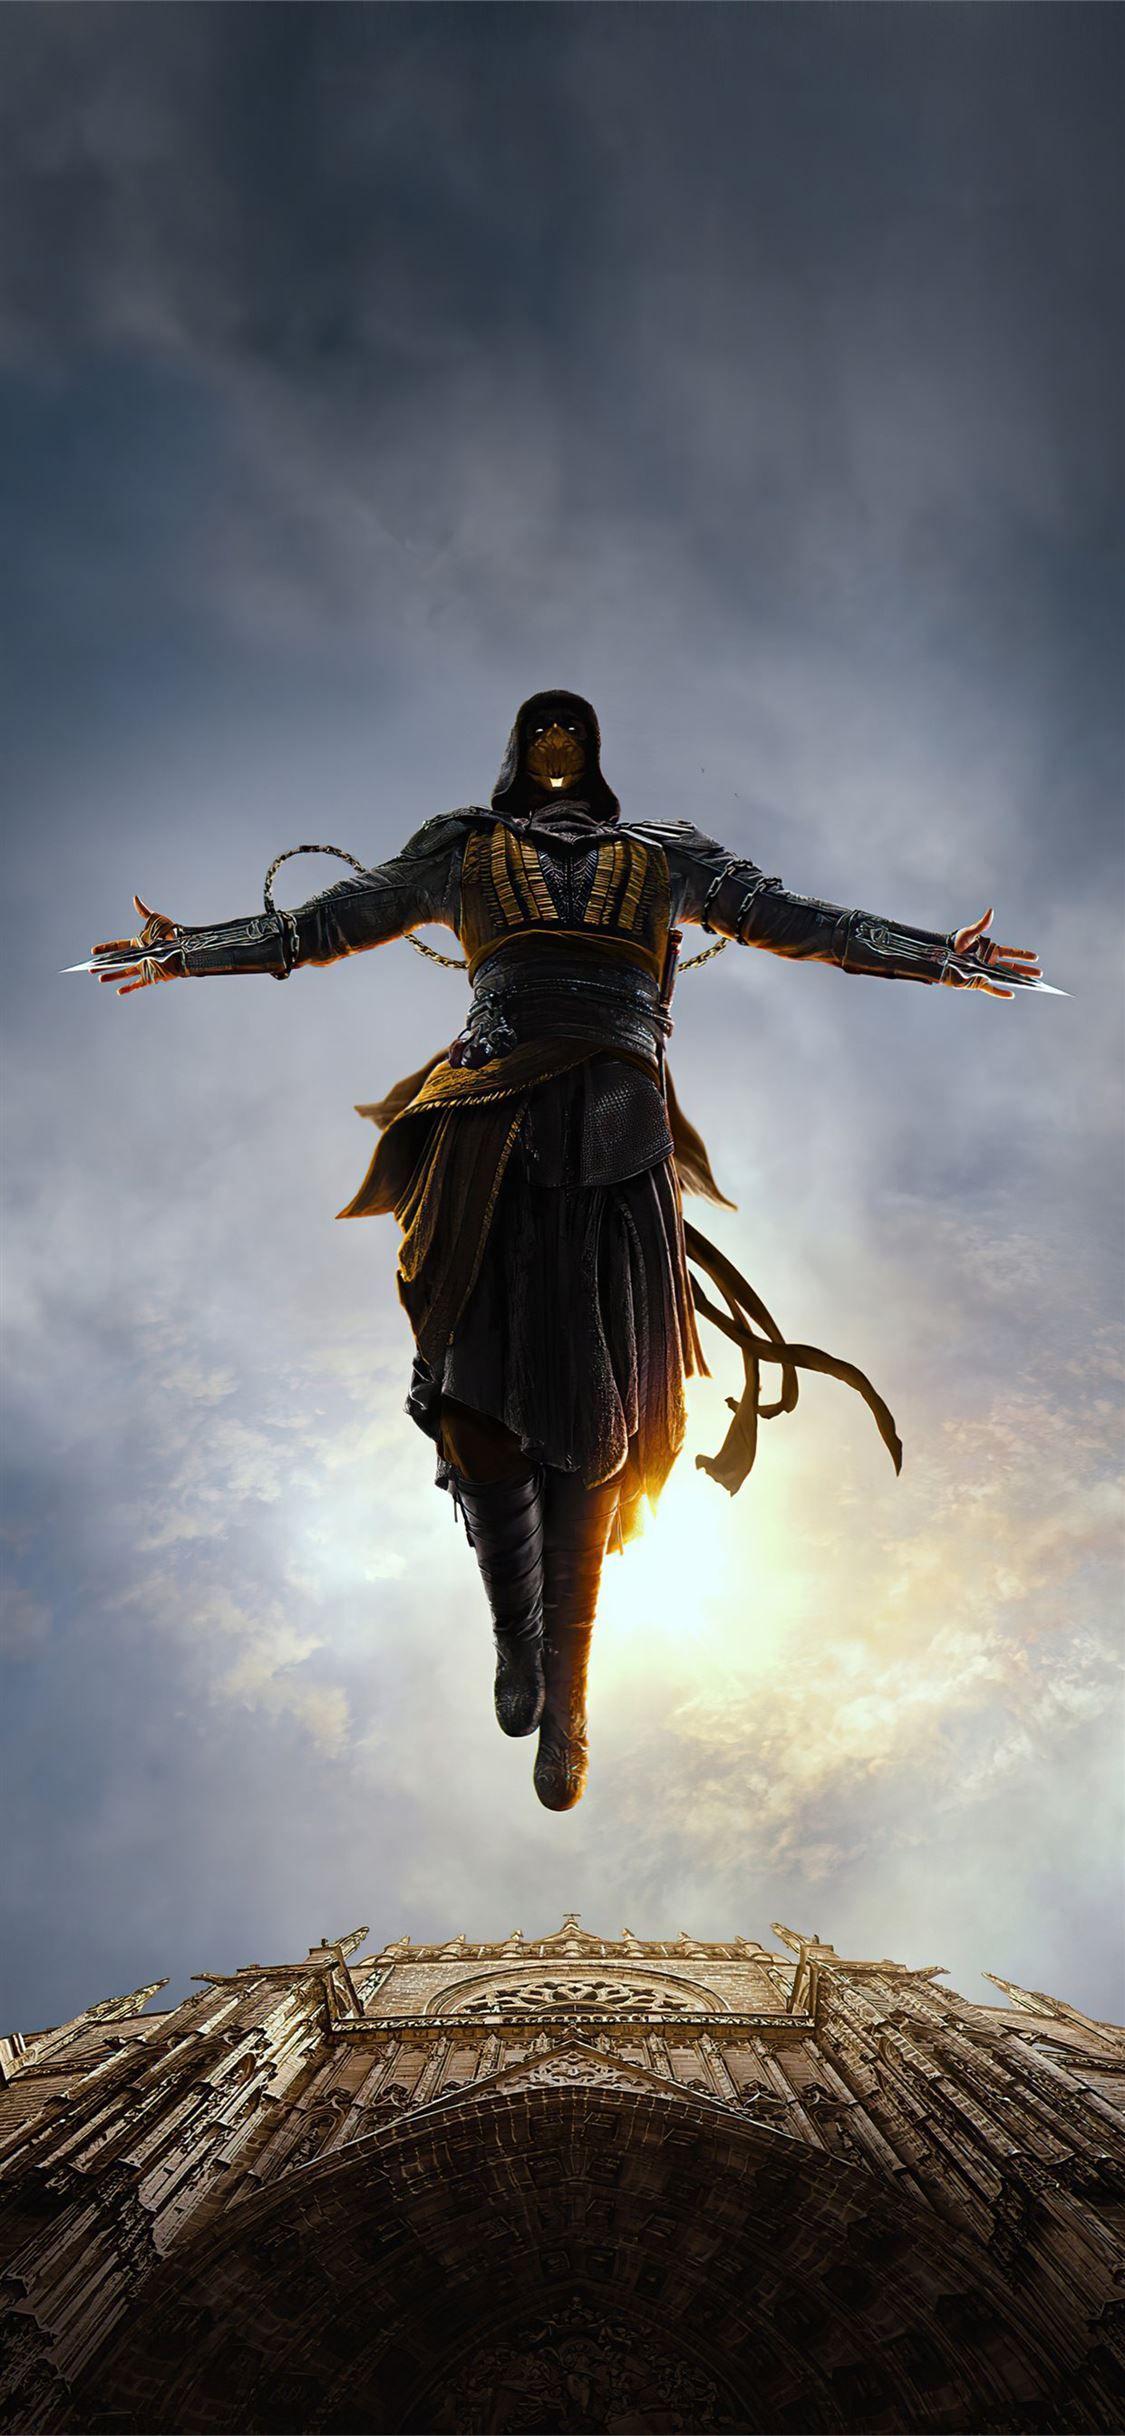 Mortal Kombat X Assassins Creed Assassinscreed Games Xboxgames Psgames Pcgames Assassins Creed Wallpaper Iphone Assassin S Creed Wallpaper Assassins Creed